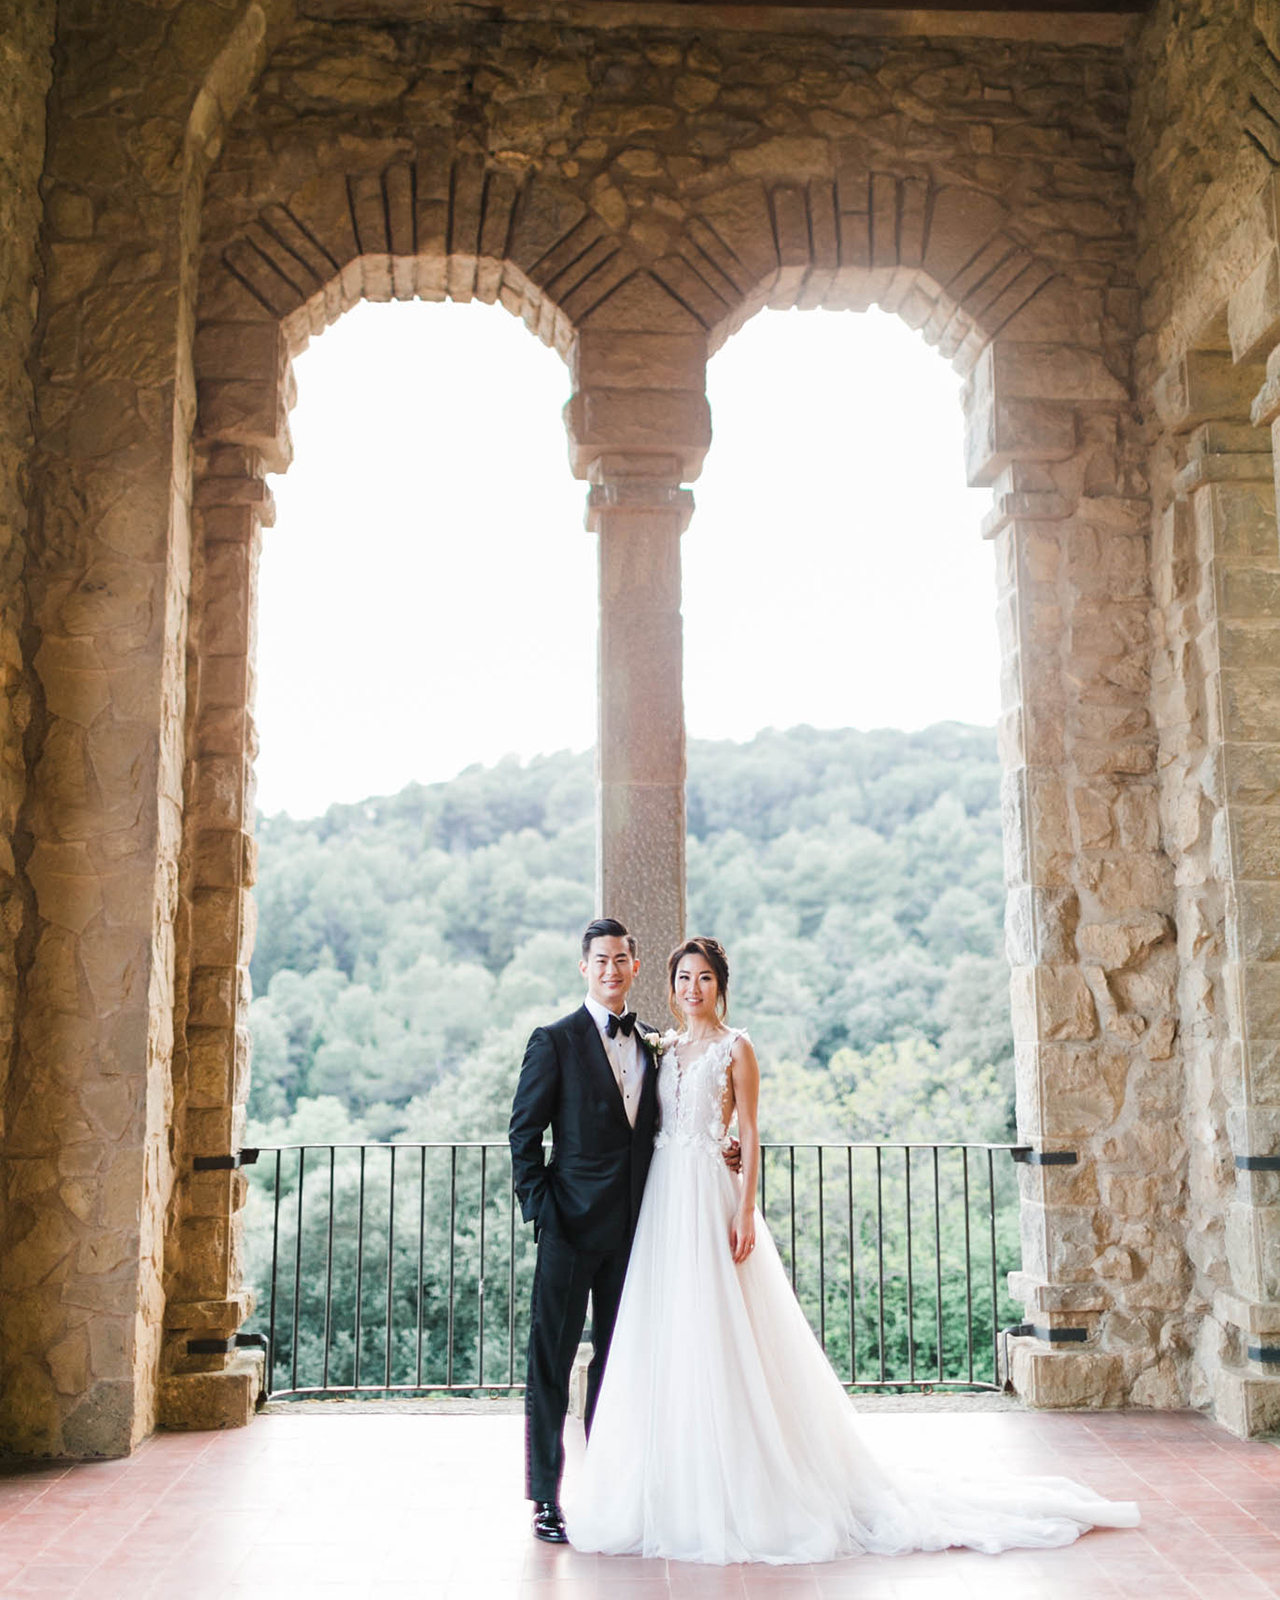 bride groom wedding day pose castle balcony view